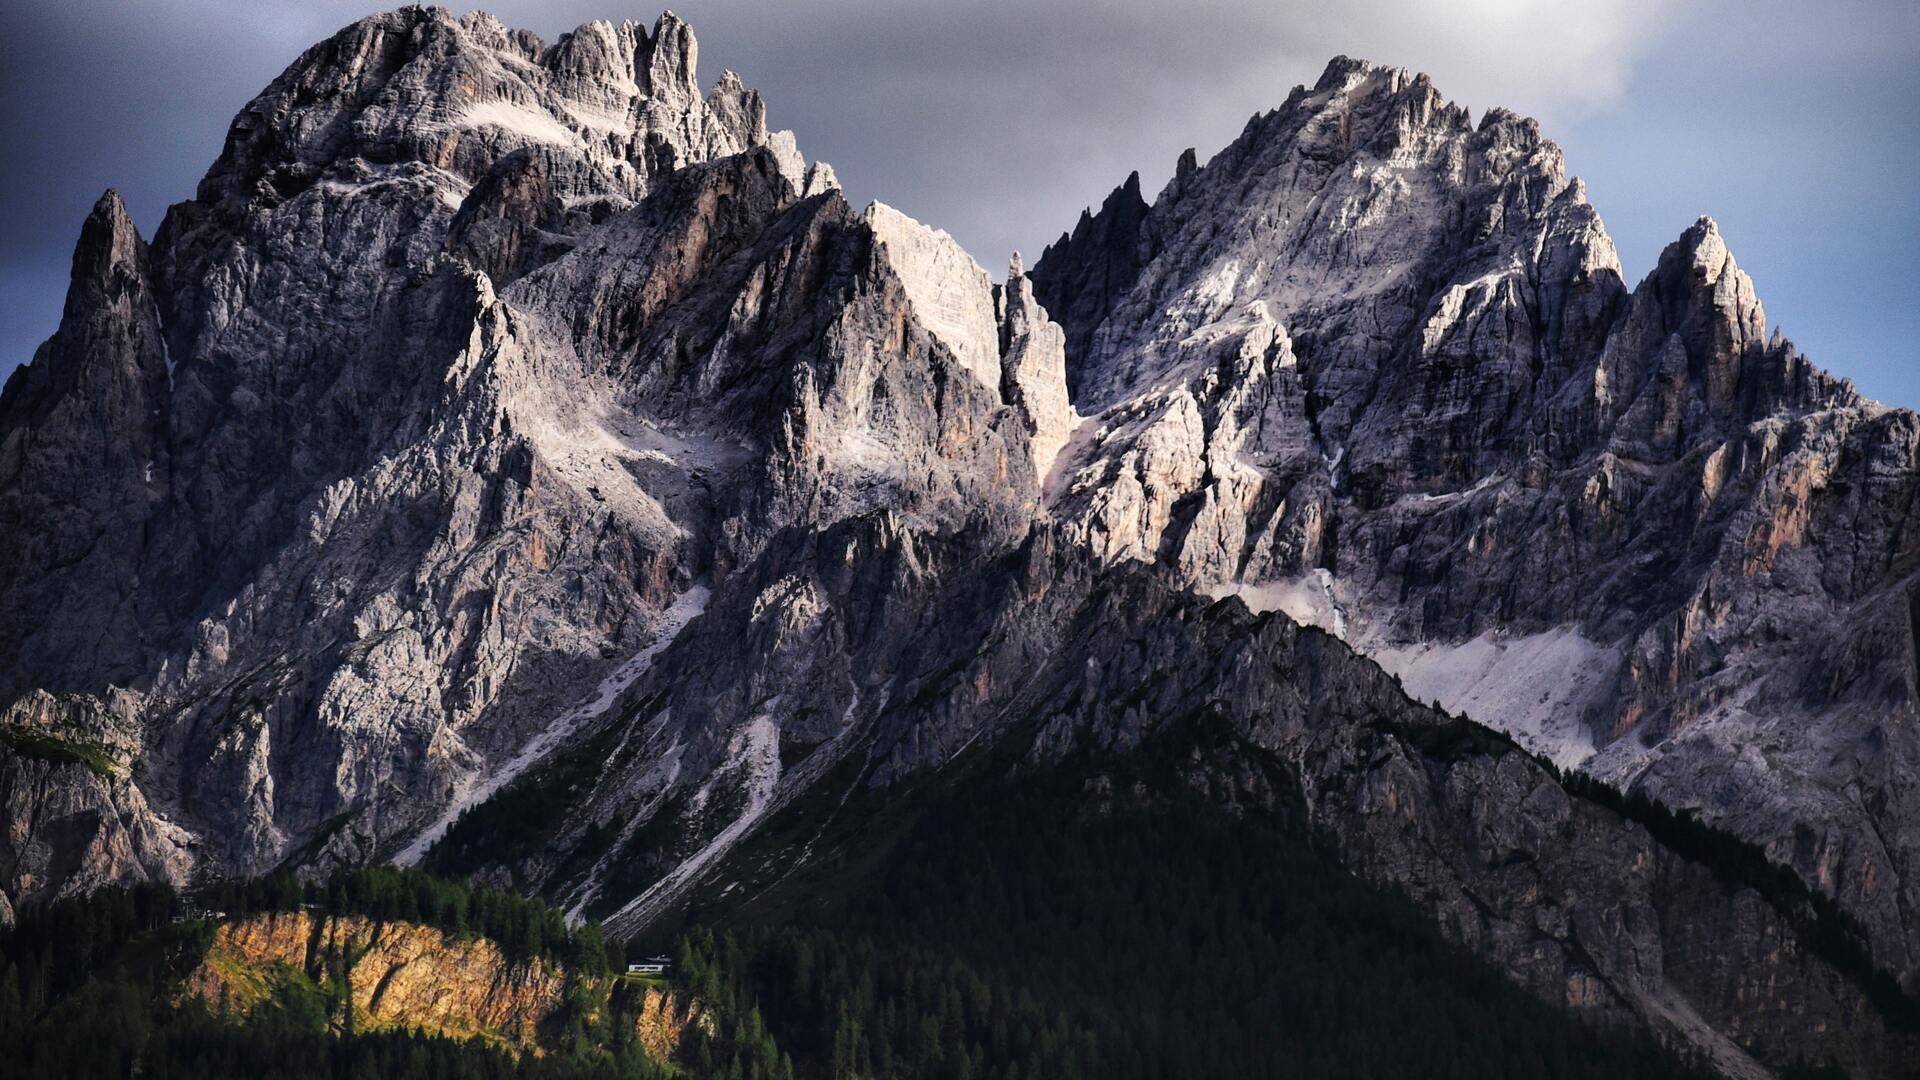 dolomite-mountains-italy-4k-zg.jpg